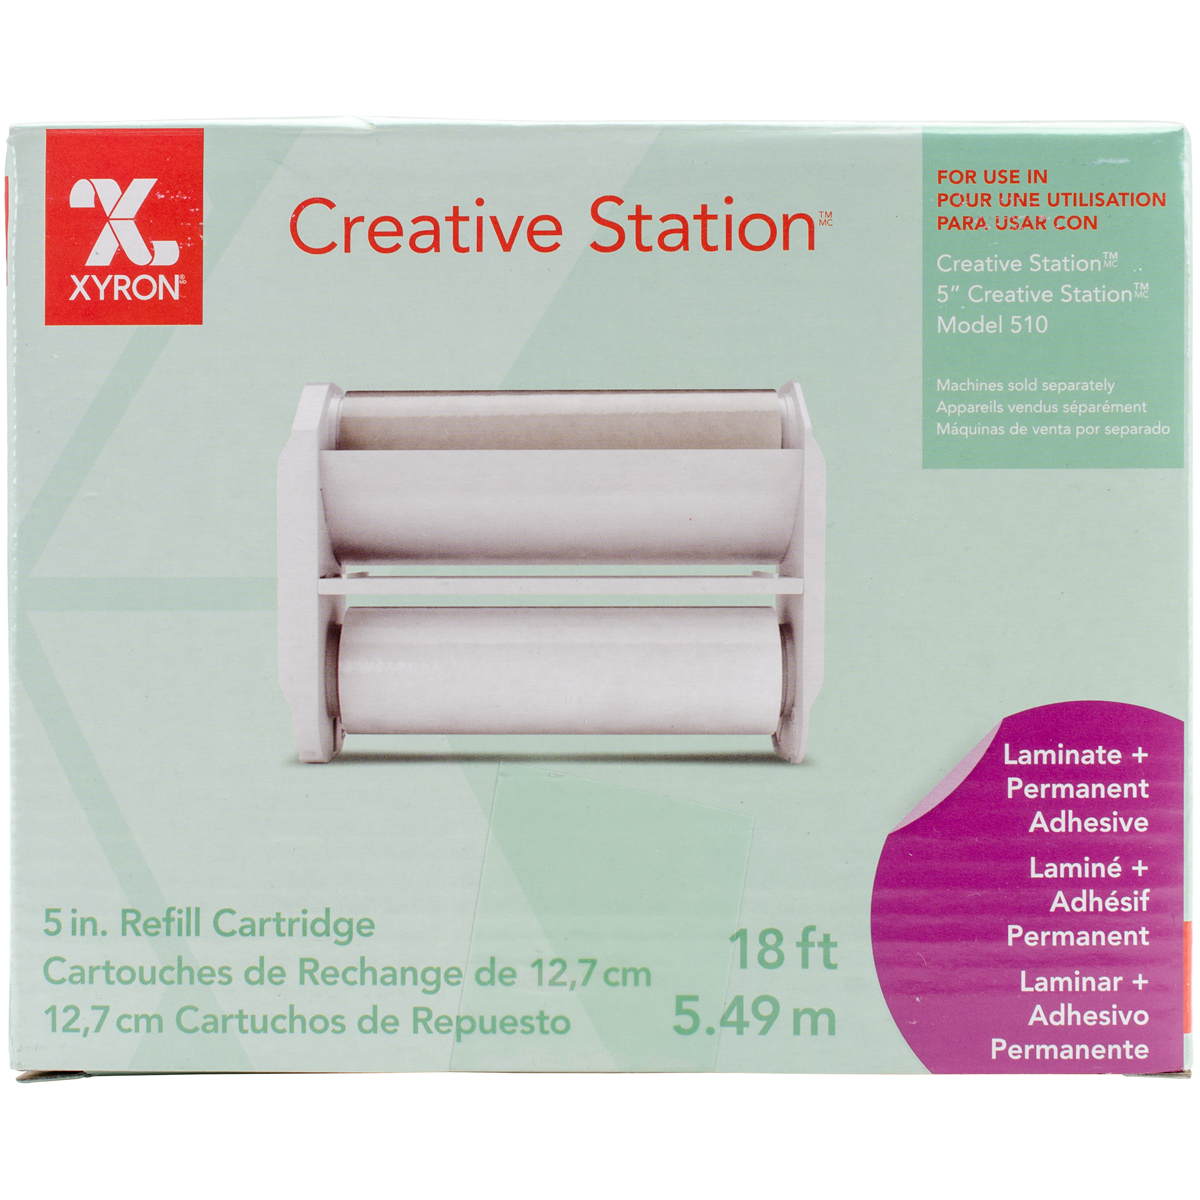 "Xyron Creative Station Laminate/Adhesive Cartridge 5""X18'-"